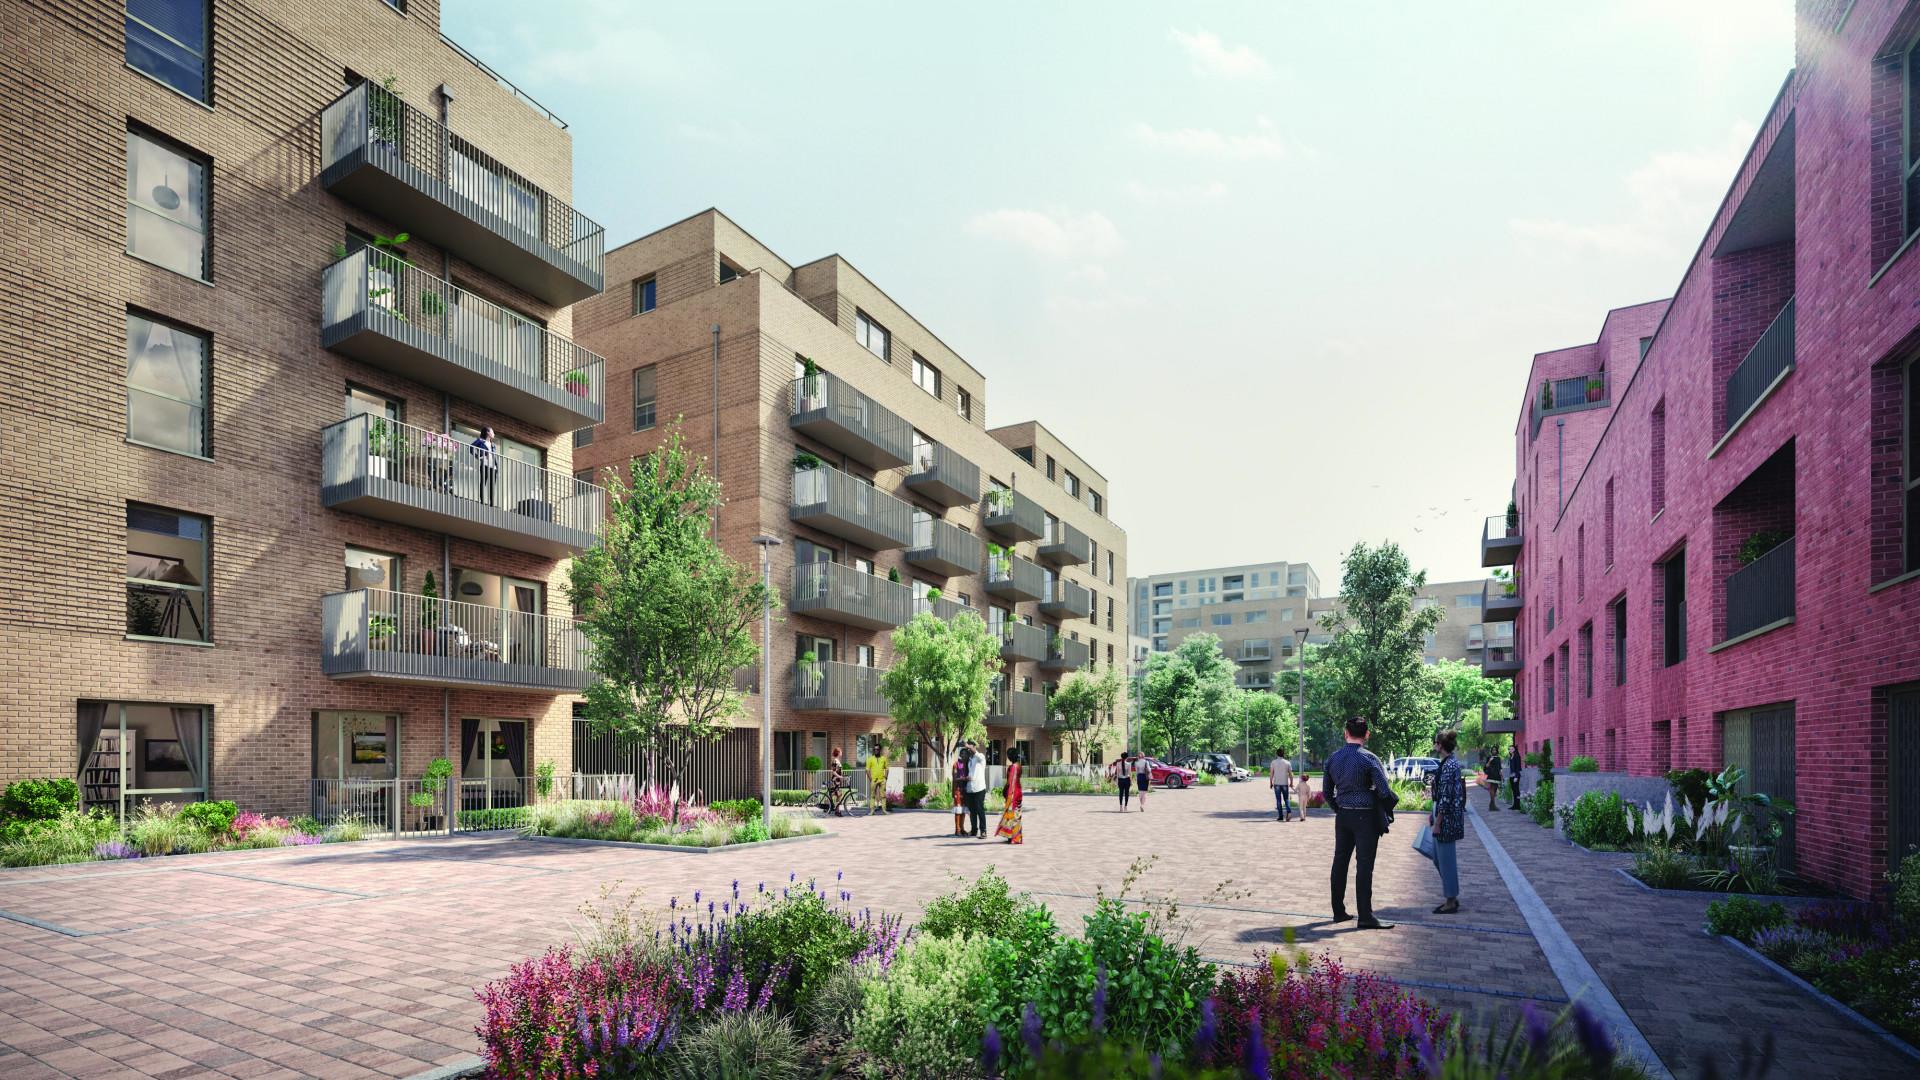 Eastman Village Development North West London Exterior CGI